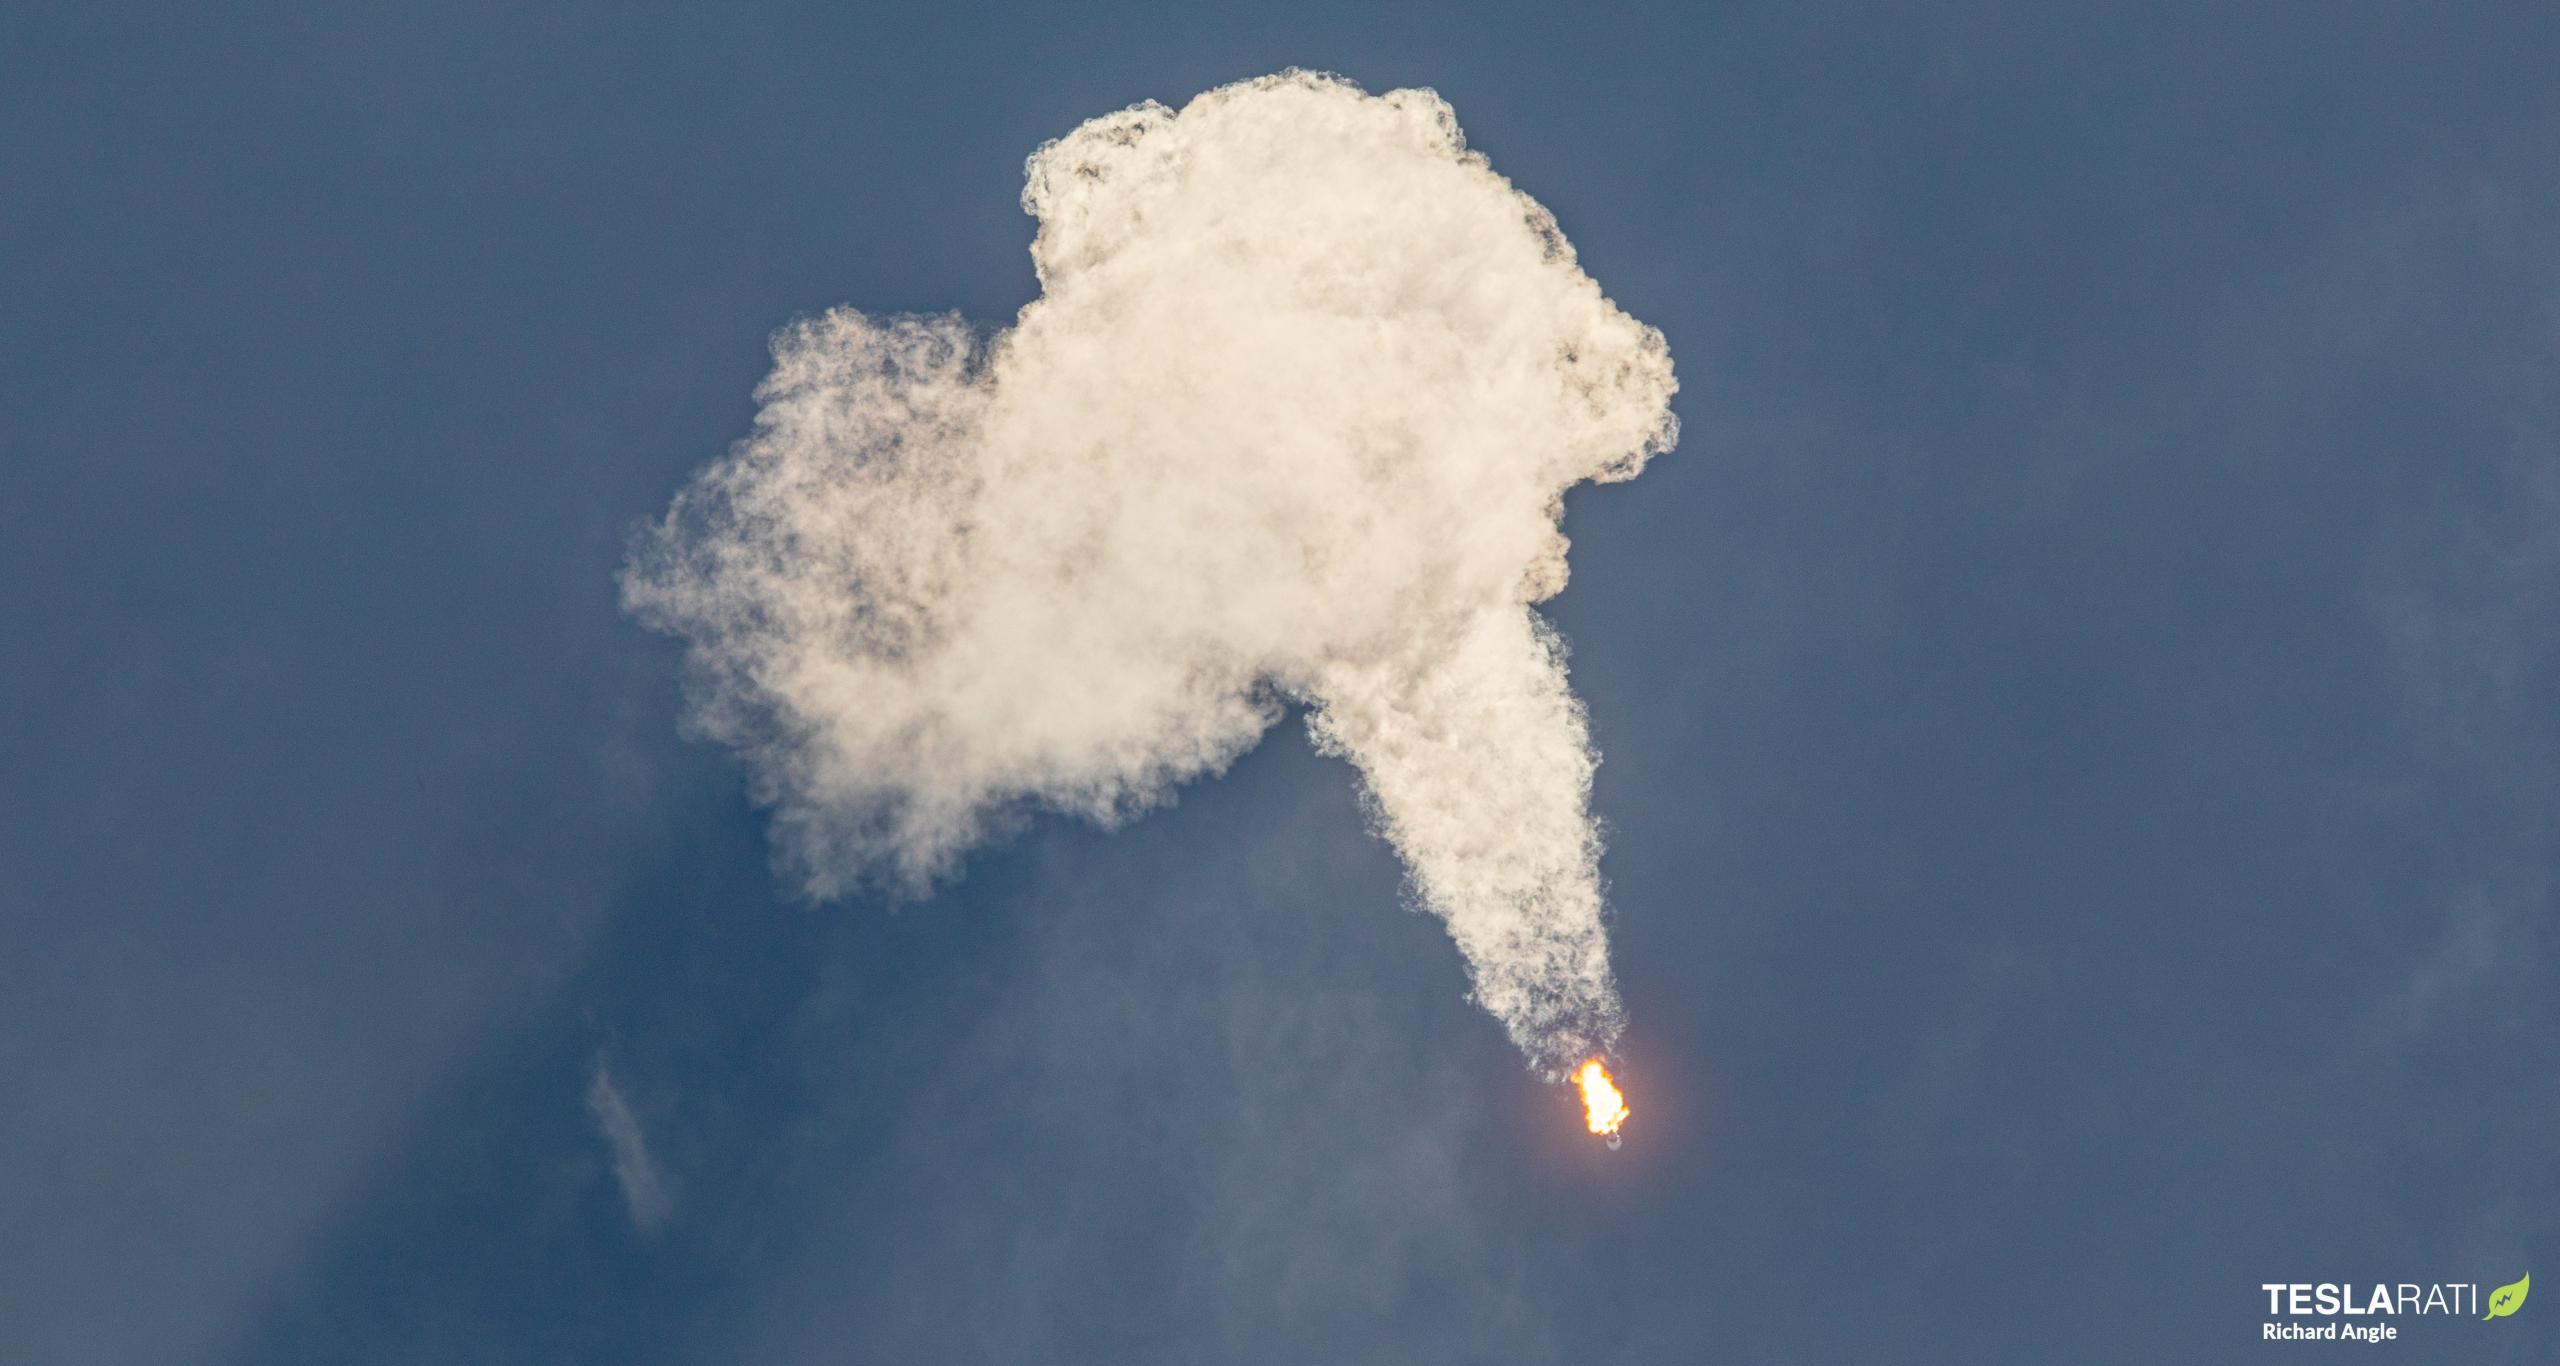 GPS III SV05 Falcon 9 B1062 LC40 061721 (Richard Angle) launch 2 crop (c)